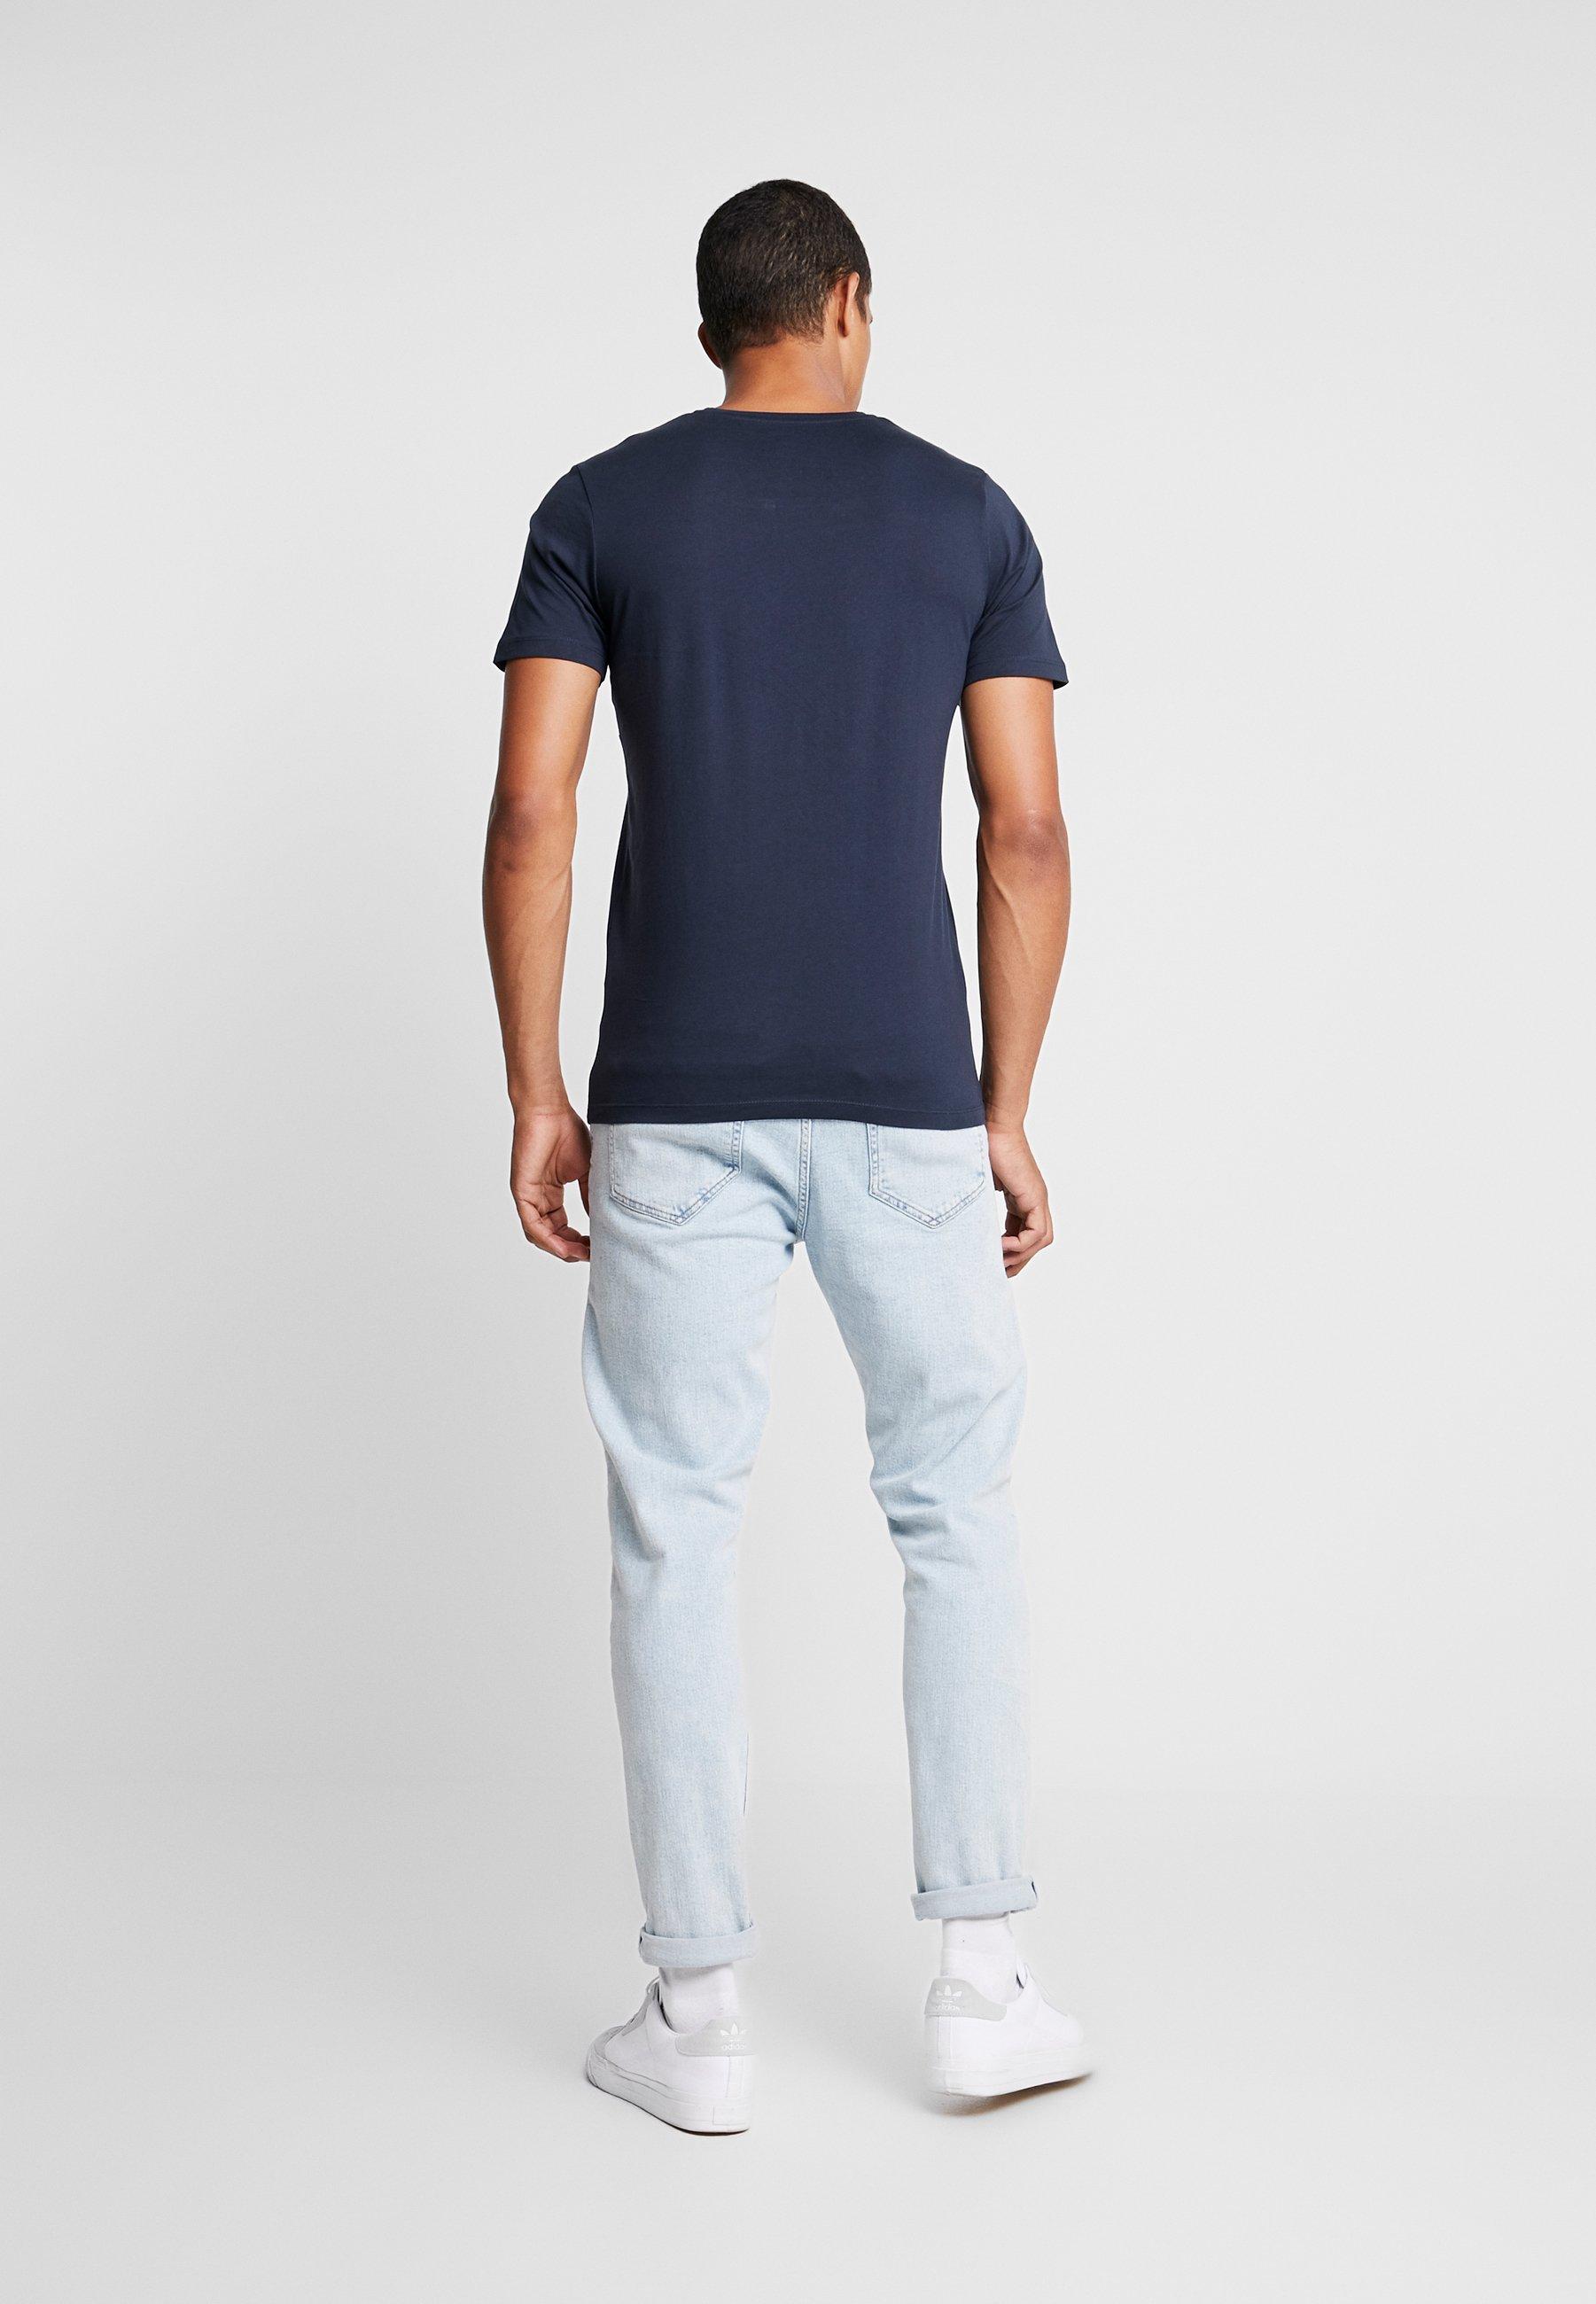 shirt Captain Jones Imprimé Sky Jackamp; JcojonahT 1TJFKcl